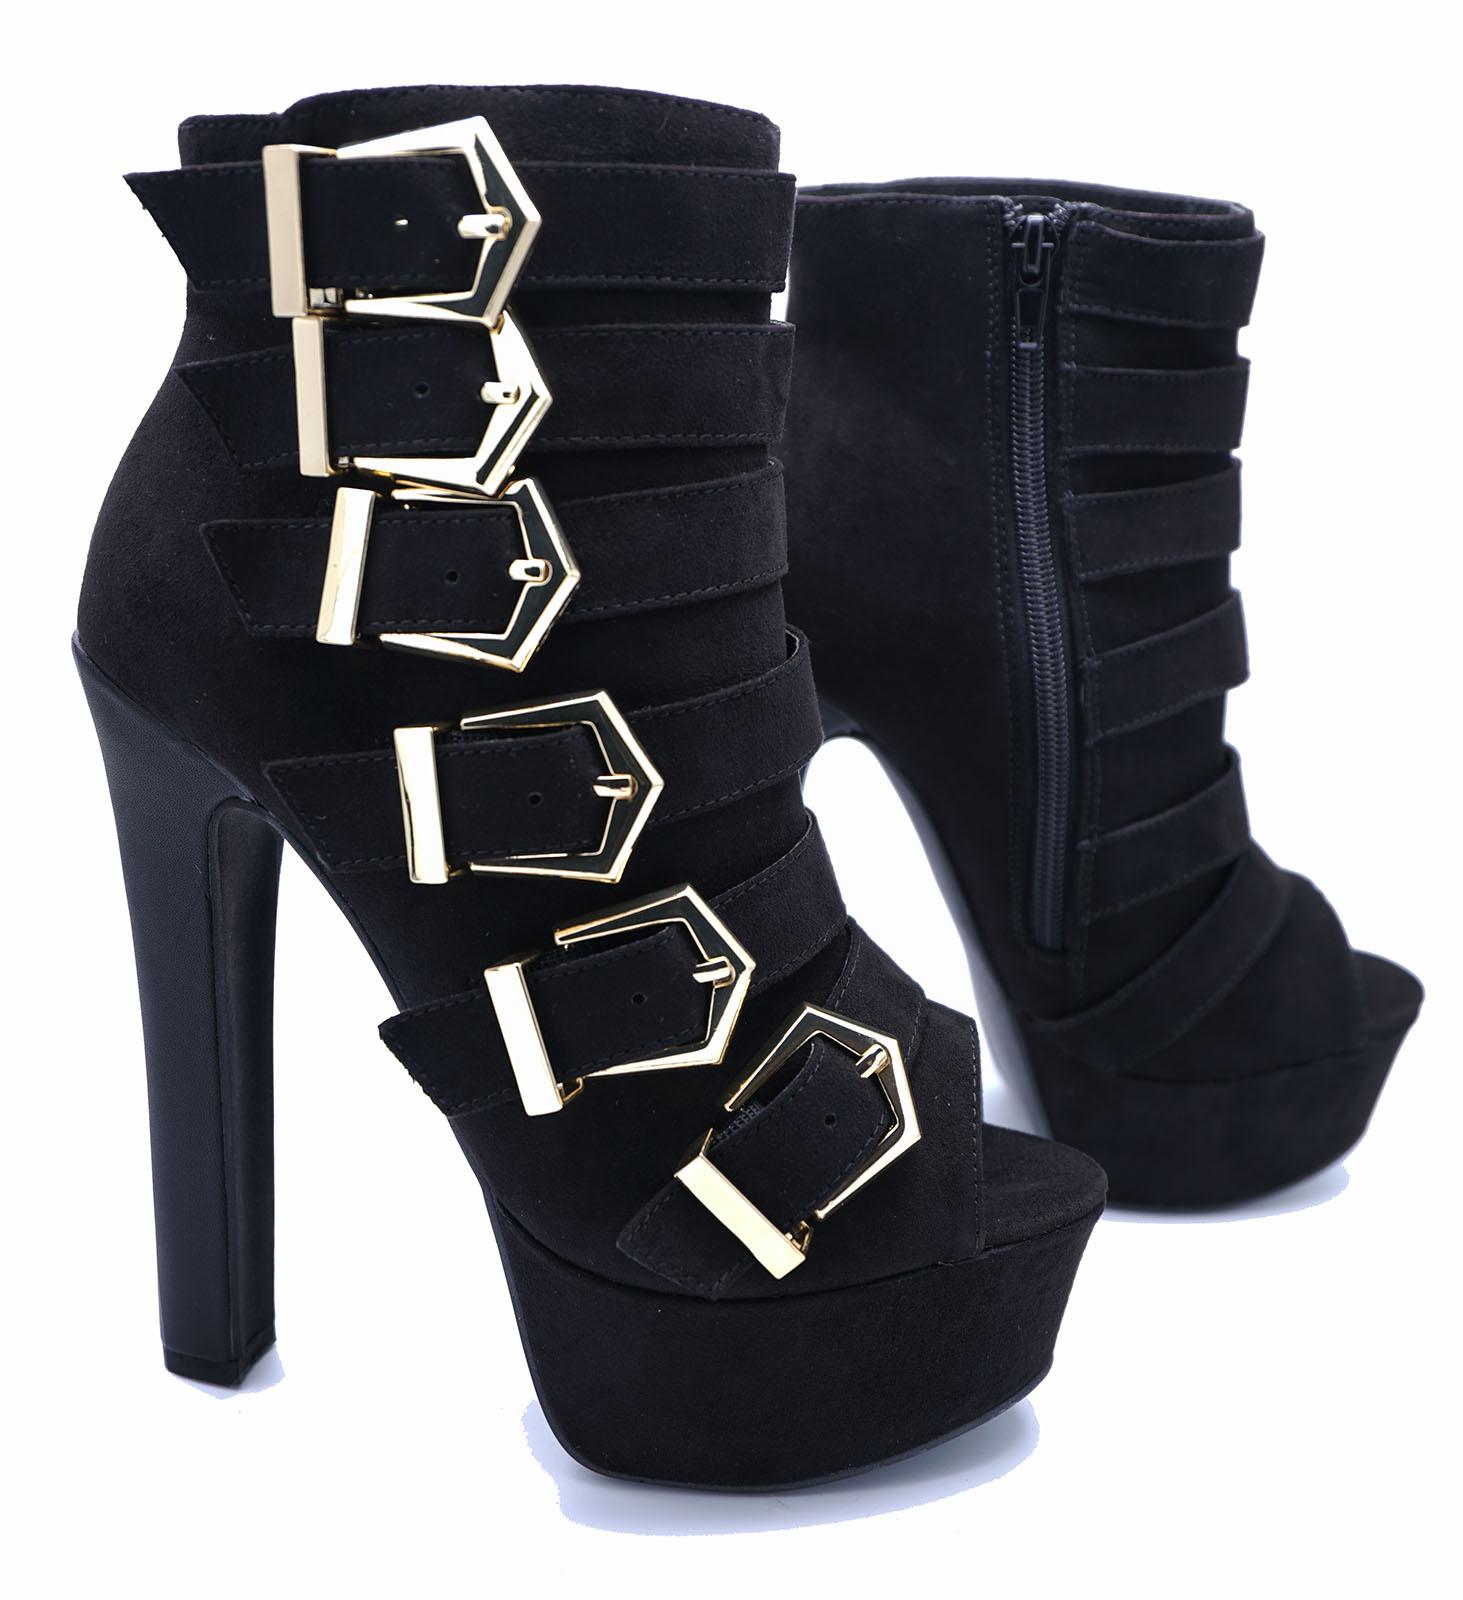 LADIES-BLACK-ZIP-UP-PLATFORM-PEEP-TOE-BUCKLE-ANKLE-CALF-HIGH-HEEL-BOOTS-SIZES-3 thumbnail 32